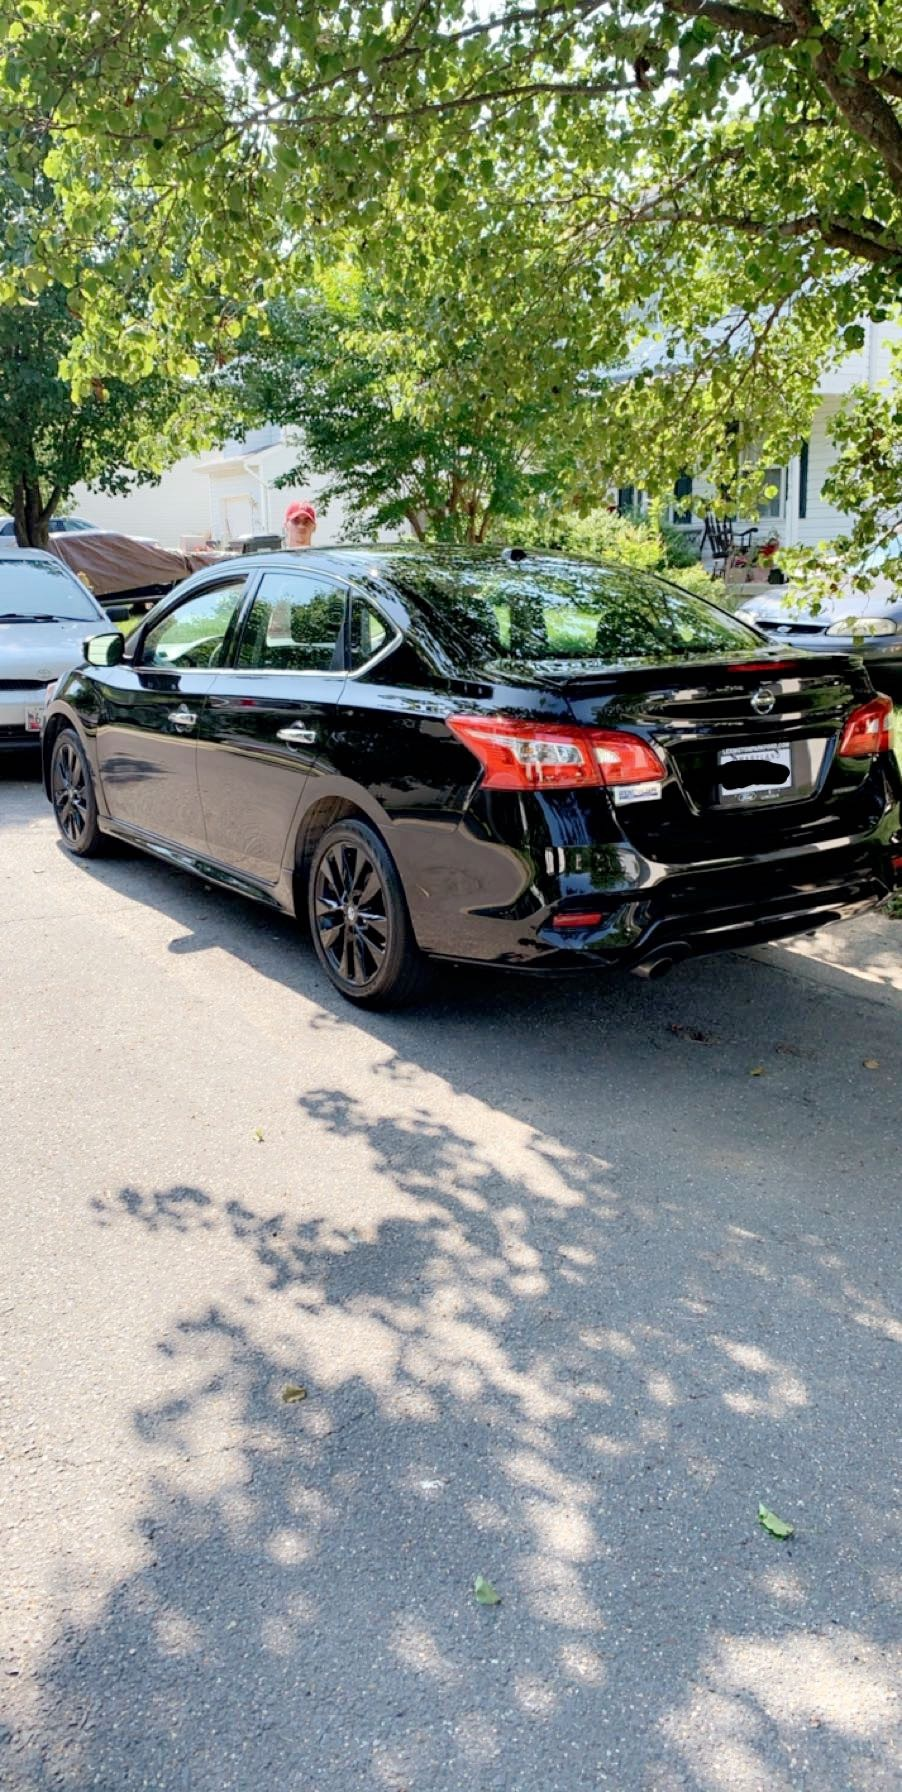 Nissan Sentra 0 60 : nissan, sentra, Stock, Nissan, Sentra, Turbo, Racing, Timeslip, Specs, DragTimes.com